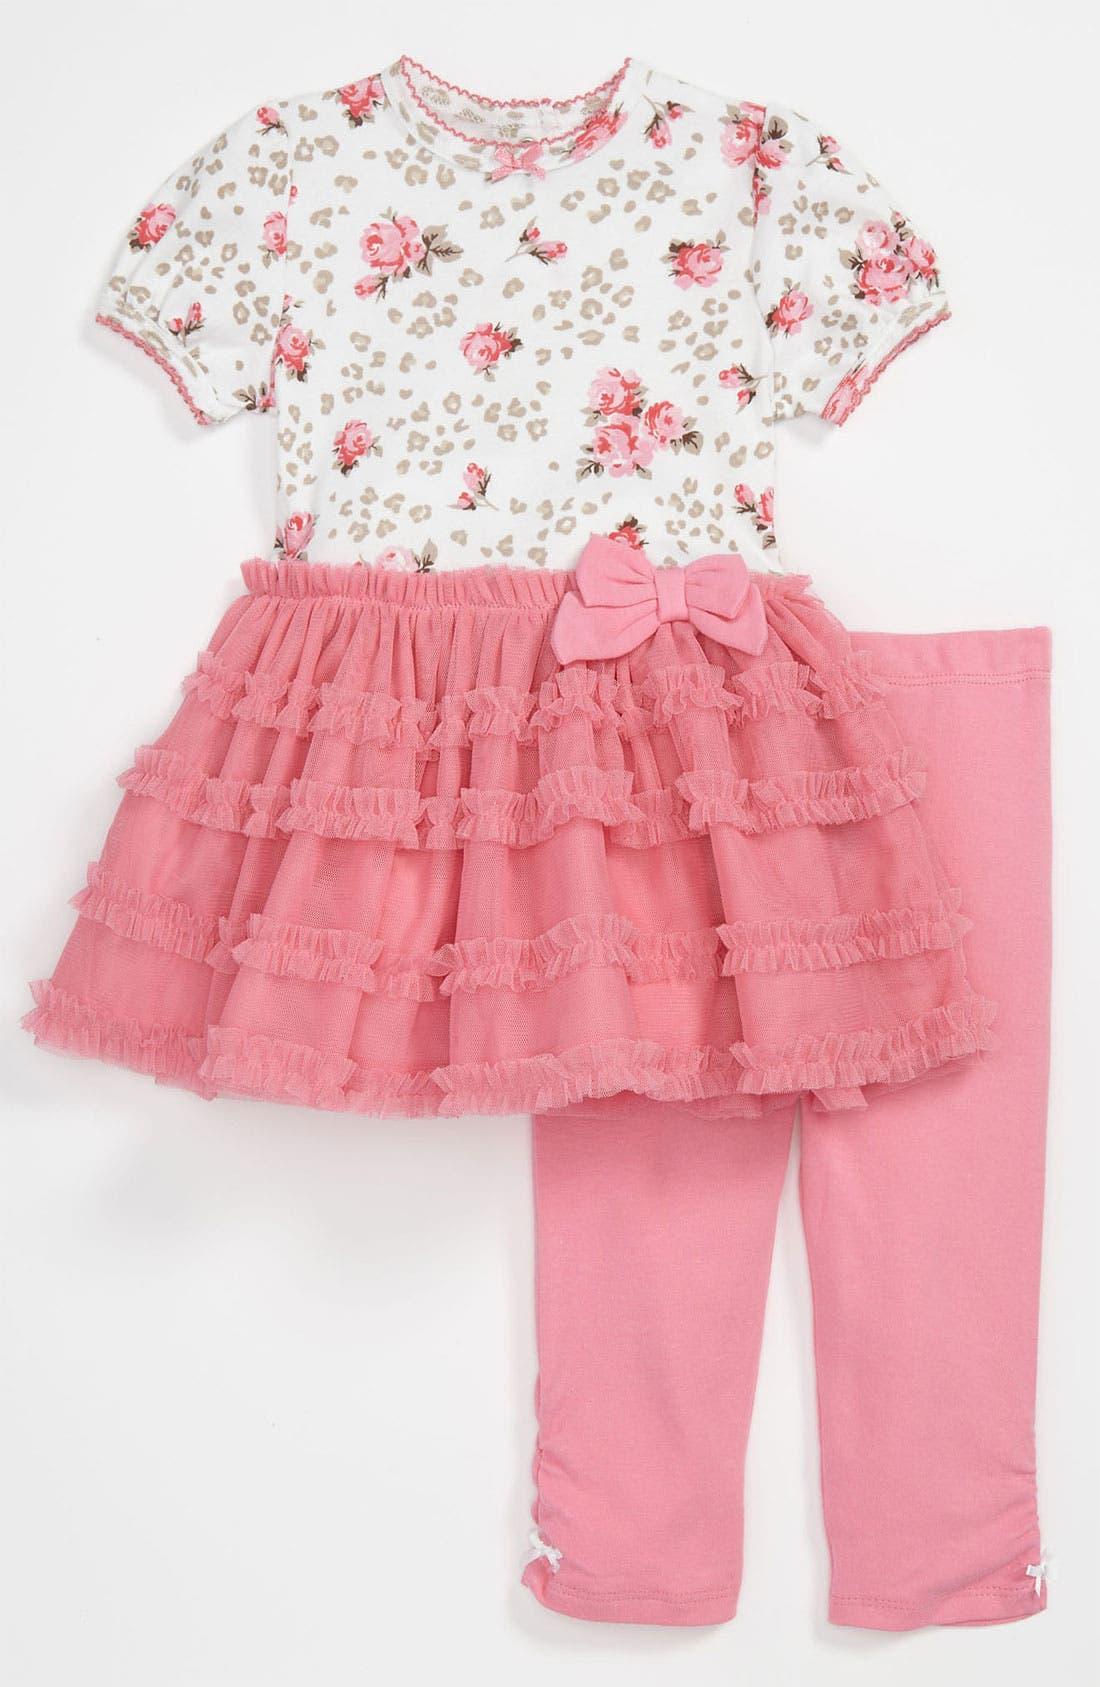 Main Image - Little Me 'Leopard Rose' Dress & Leggings (Infant)